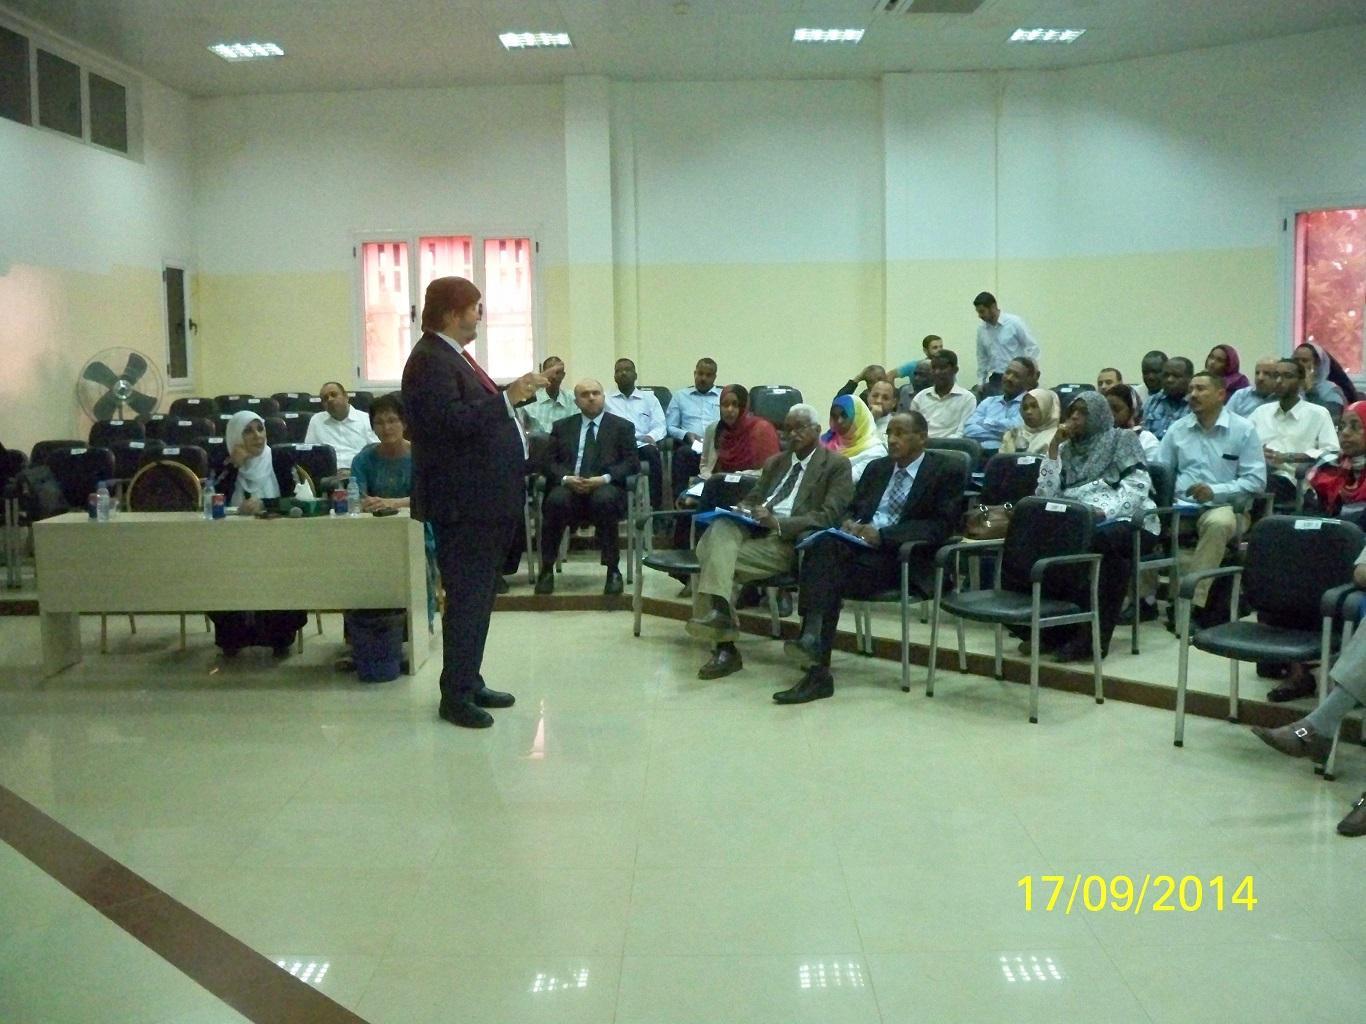 English To Italian Translator Google: Future Beacon Sponsored Antaea Medical Group Seminar At